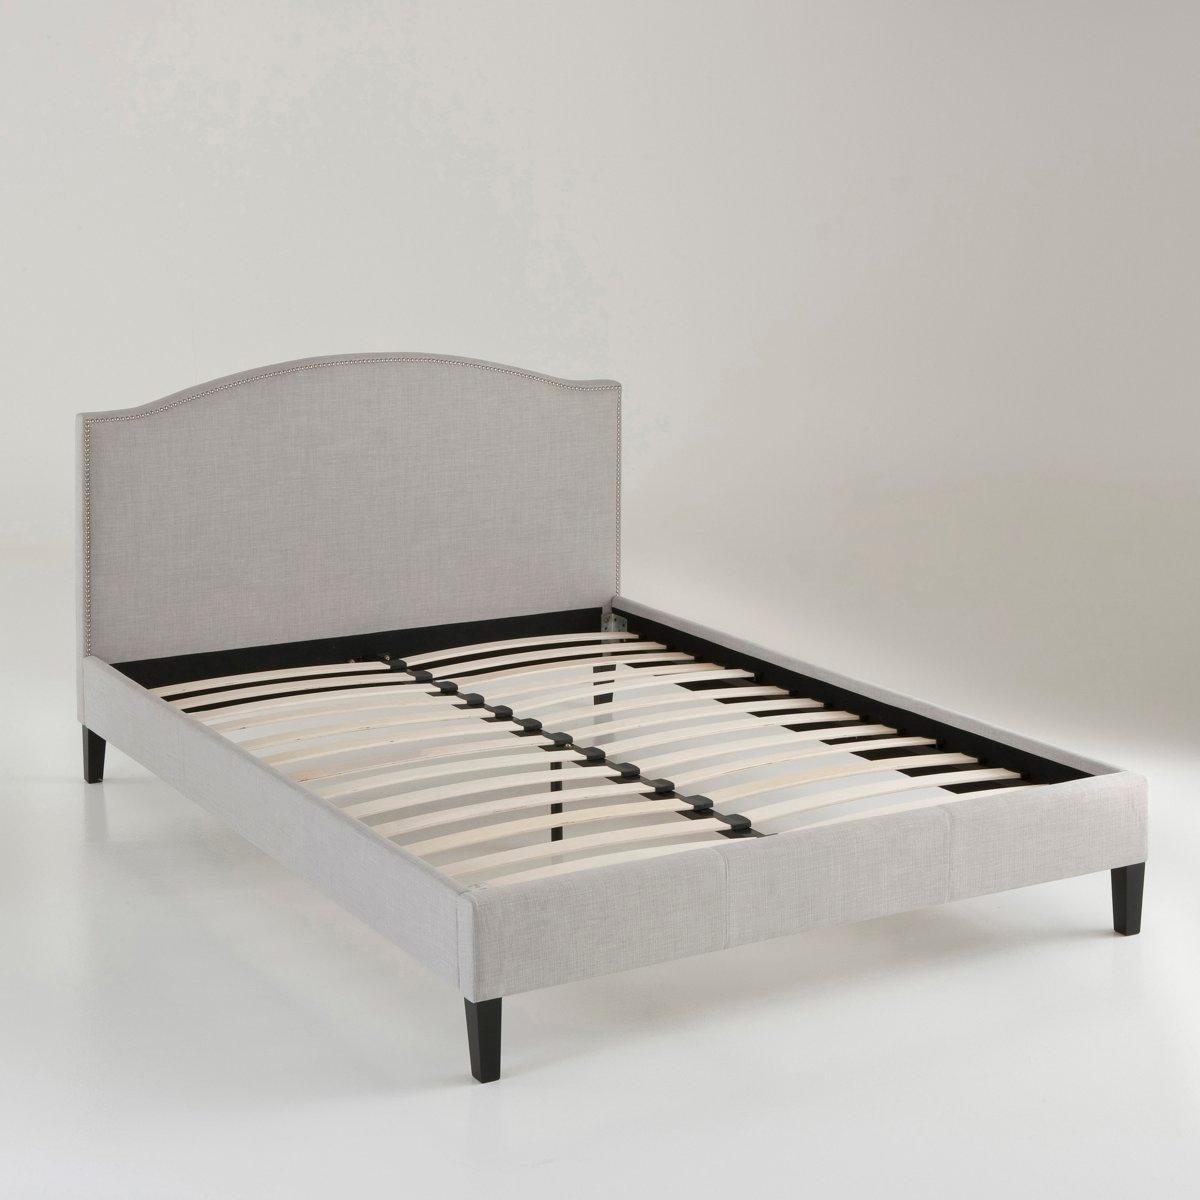 Комплект кровать+ кроватное основание, Andante La Redoute La Redoute 160 x 200 см серый m klein andante de salon